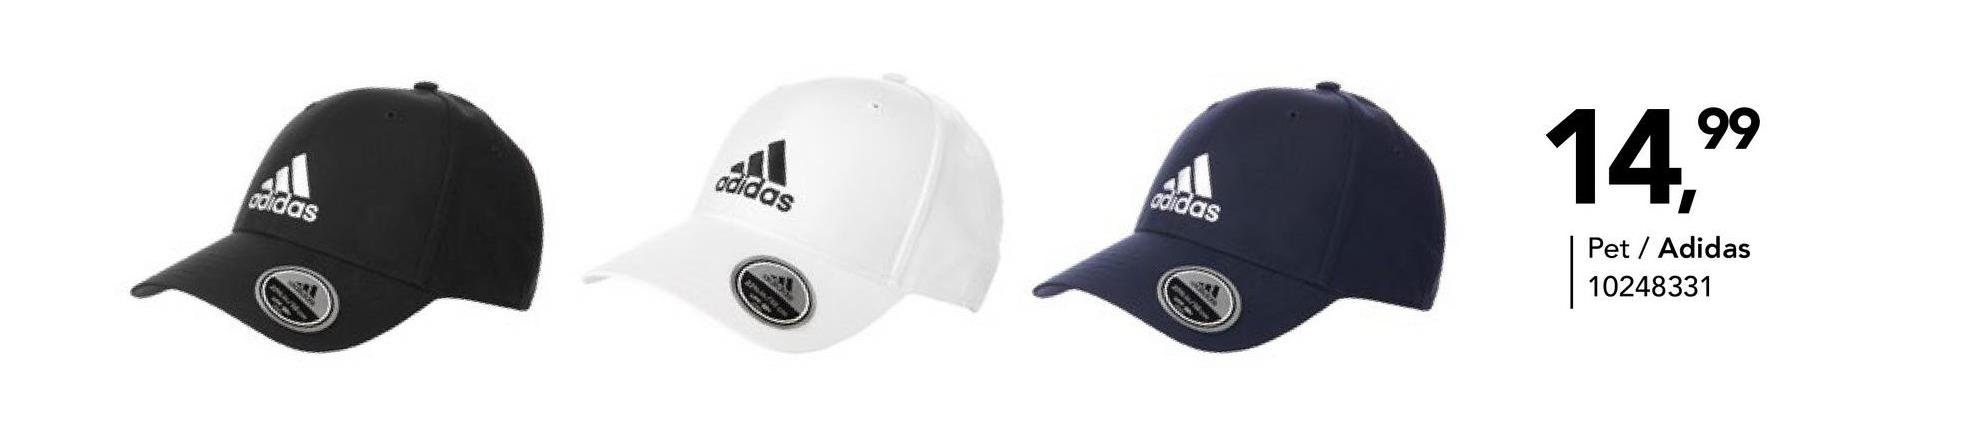 Pet Adidas - Zwart - Goedkope Sportaccessoires - Polyester Sobere, effen sportpet met Adidas-logo. Verkrijgbaar in verschillende kleuren.